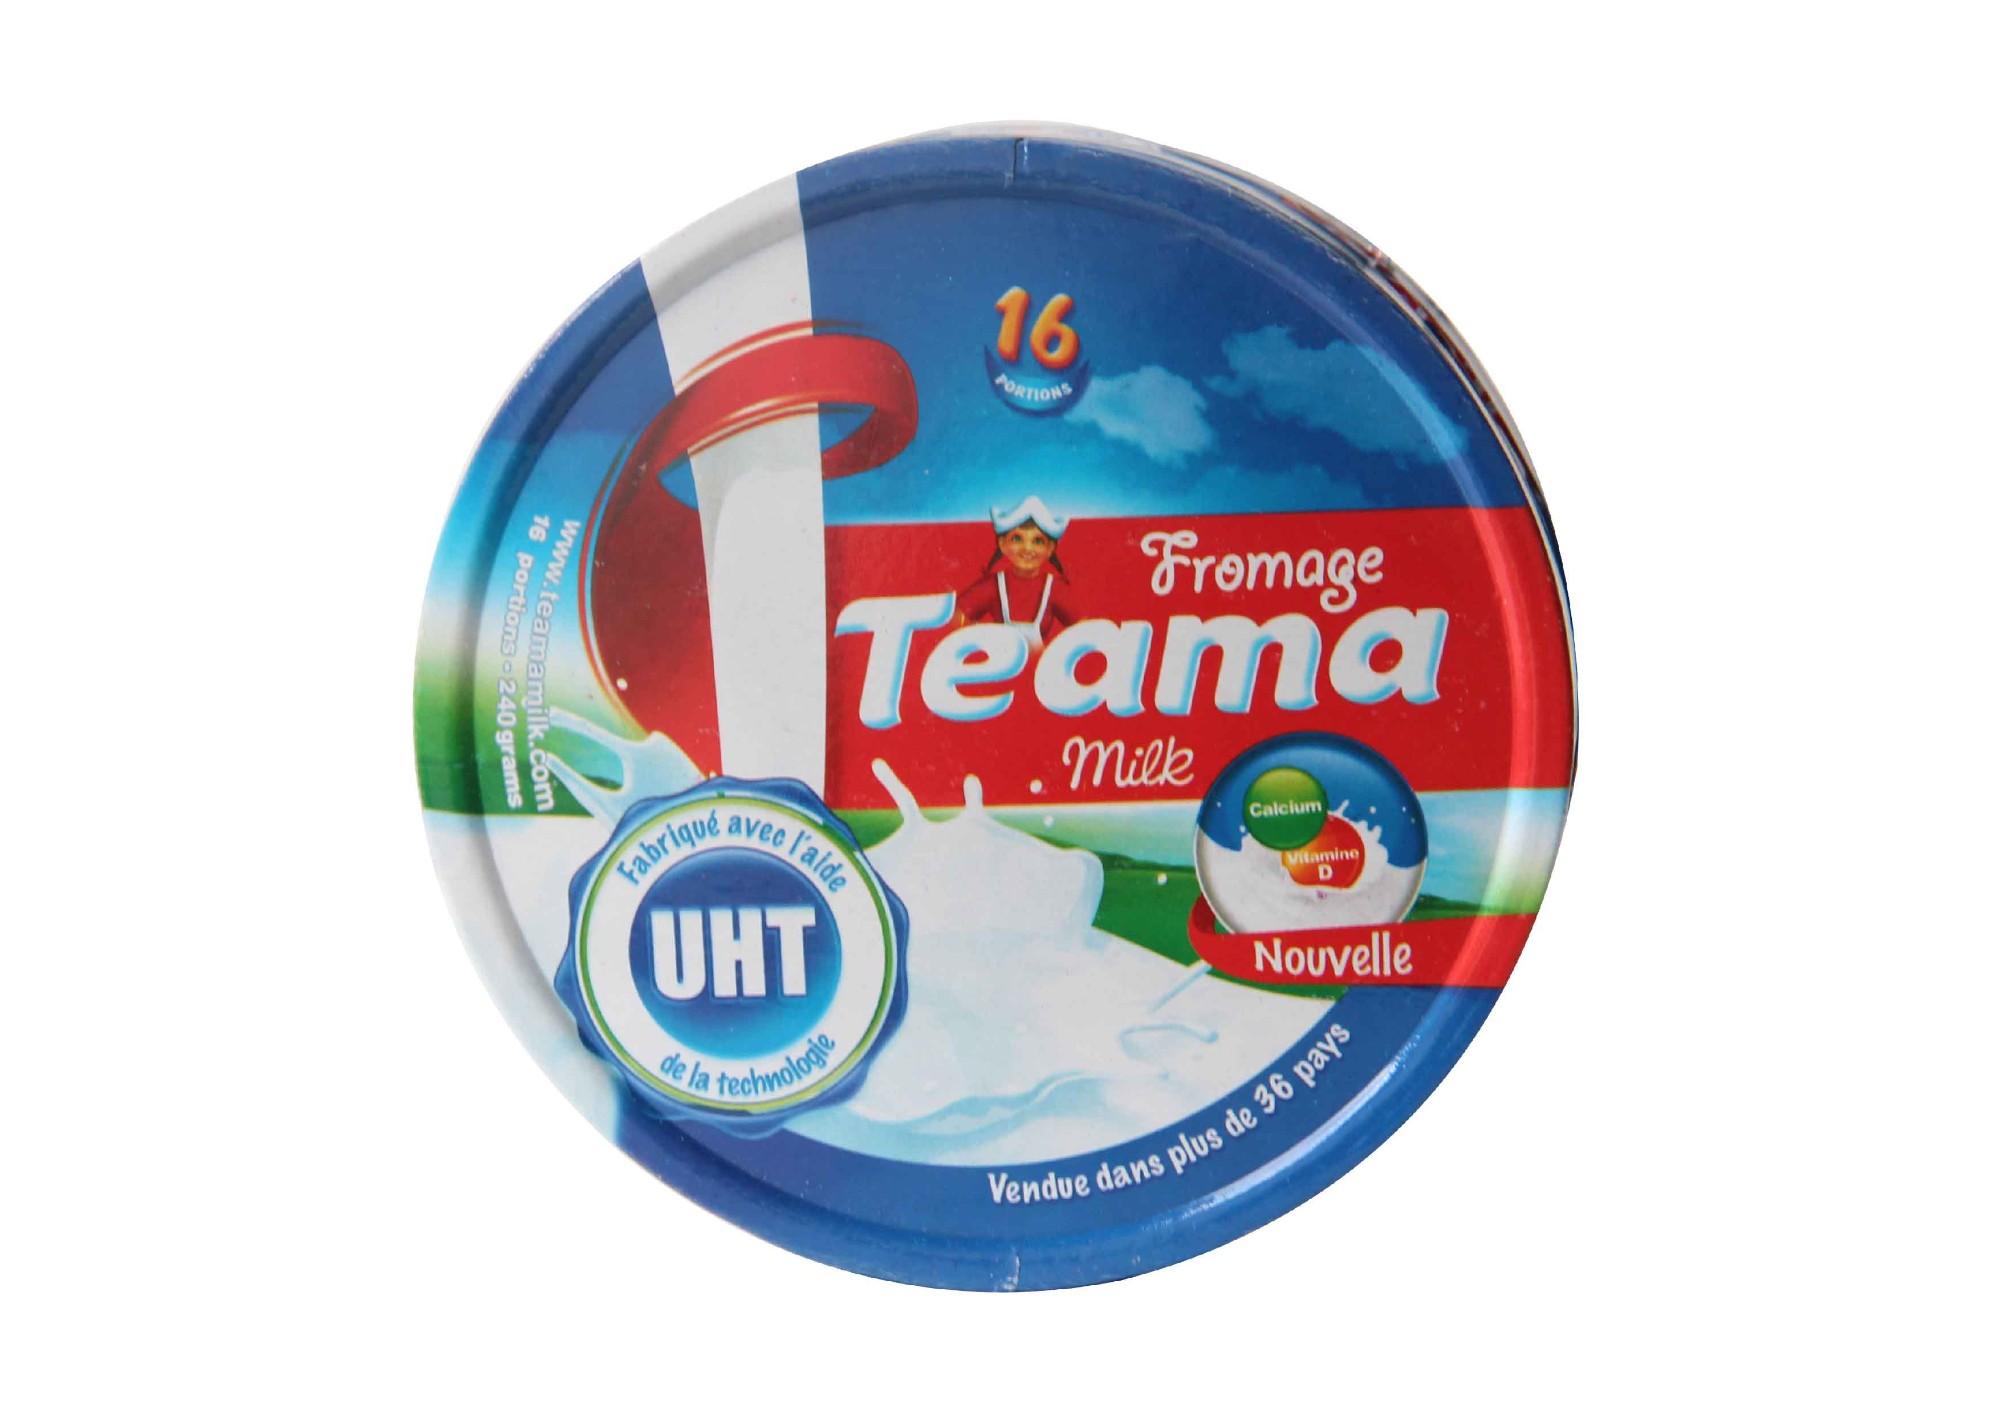 Phomai Teama 16 miếng